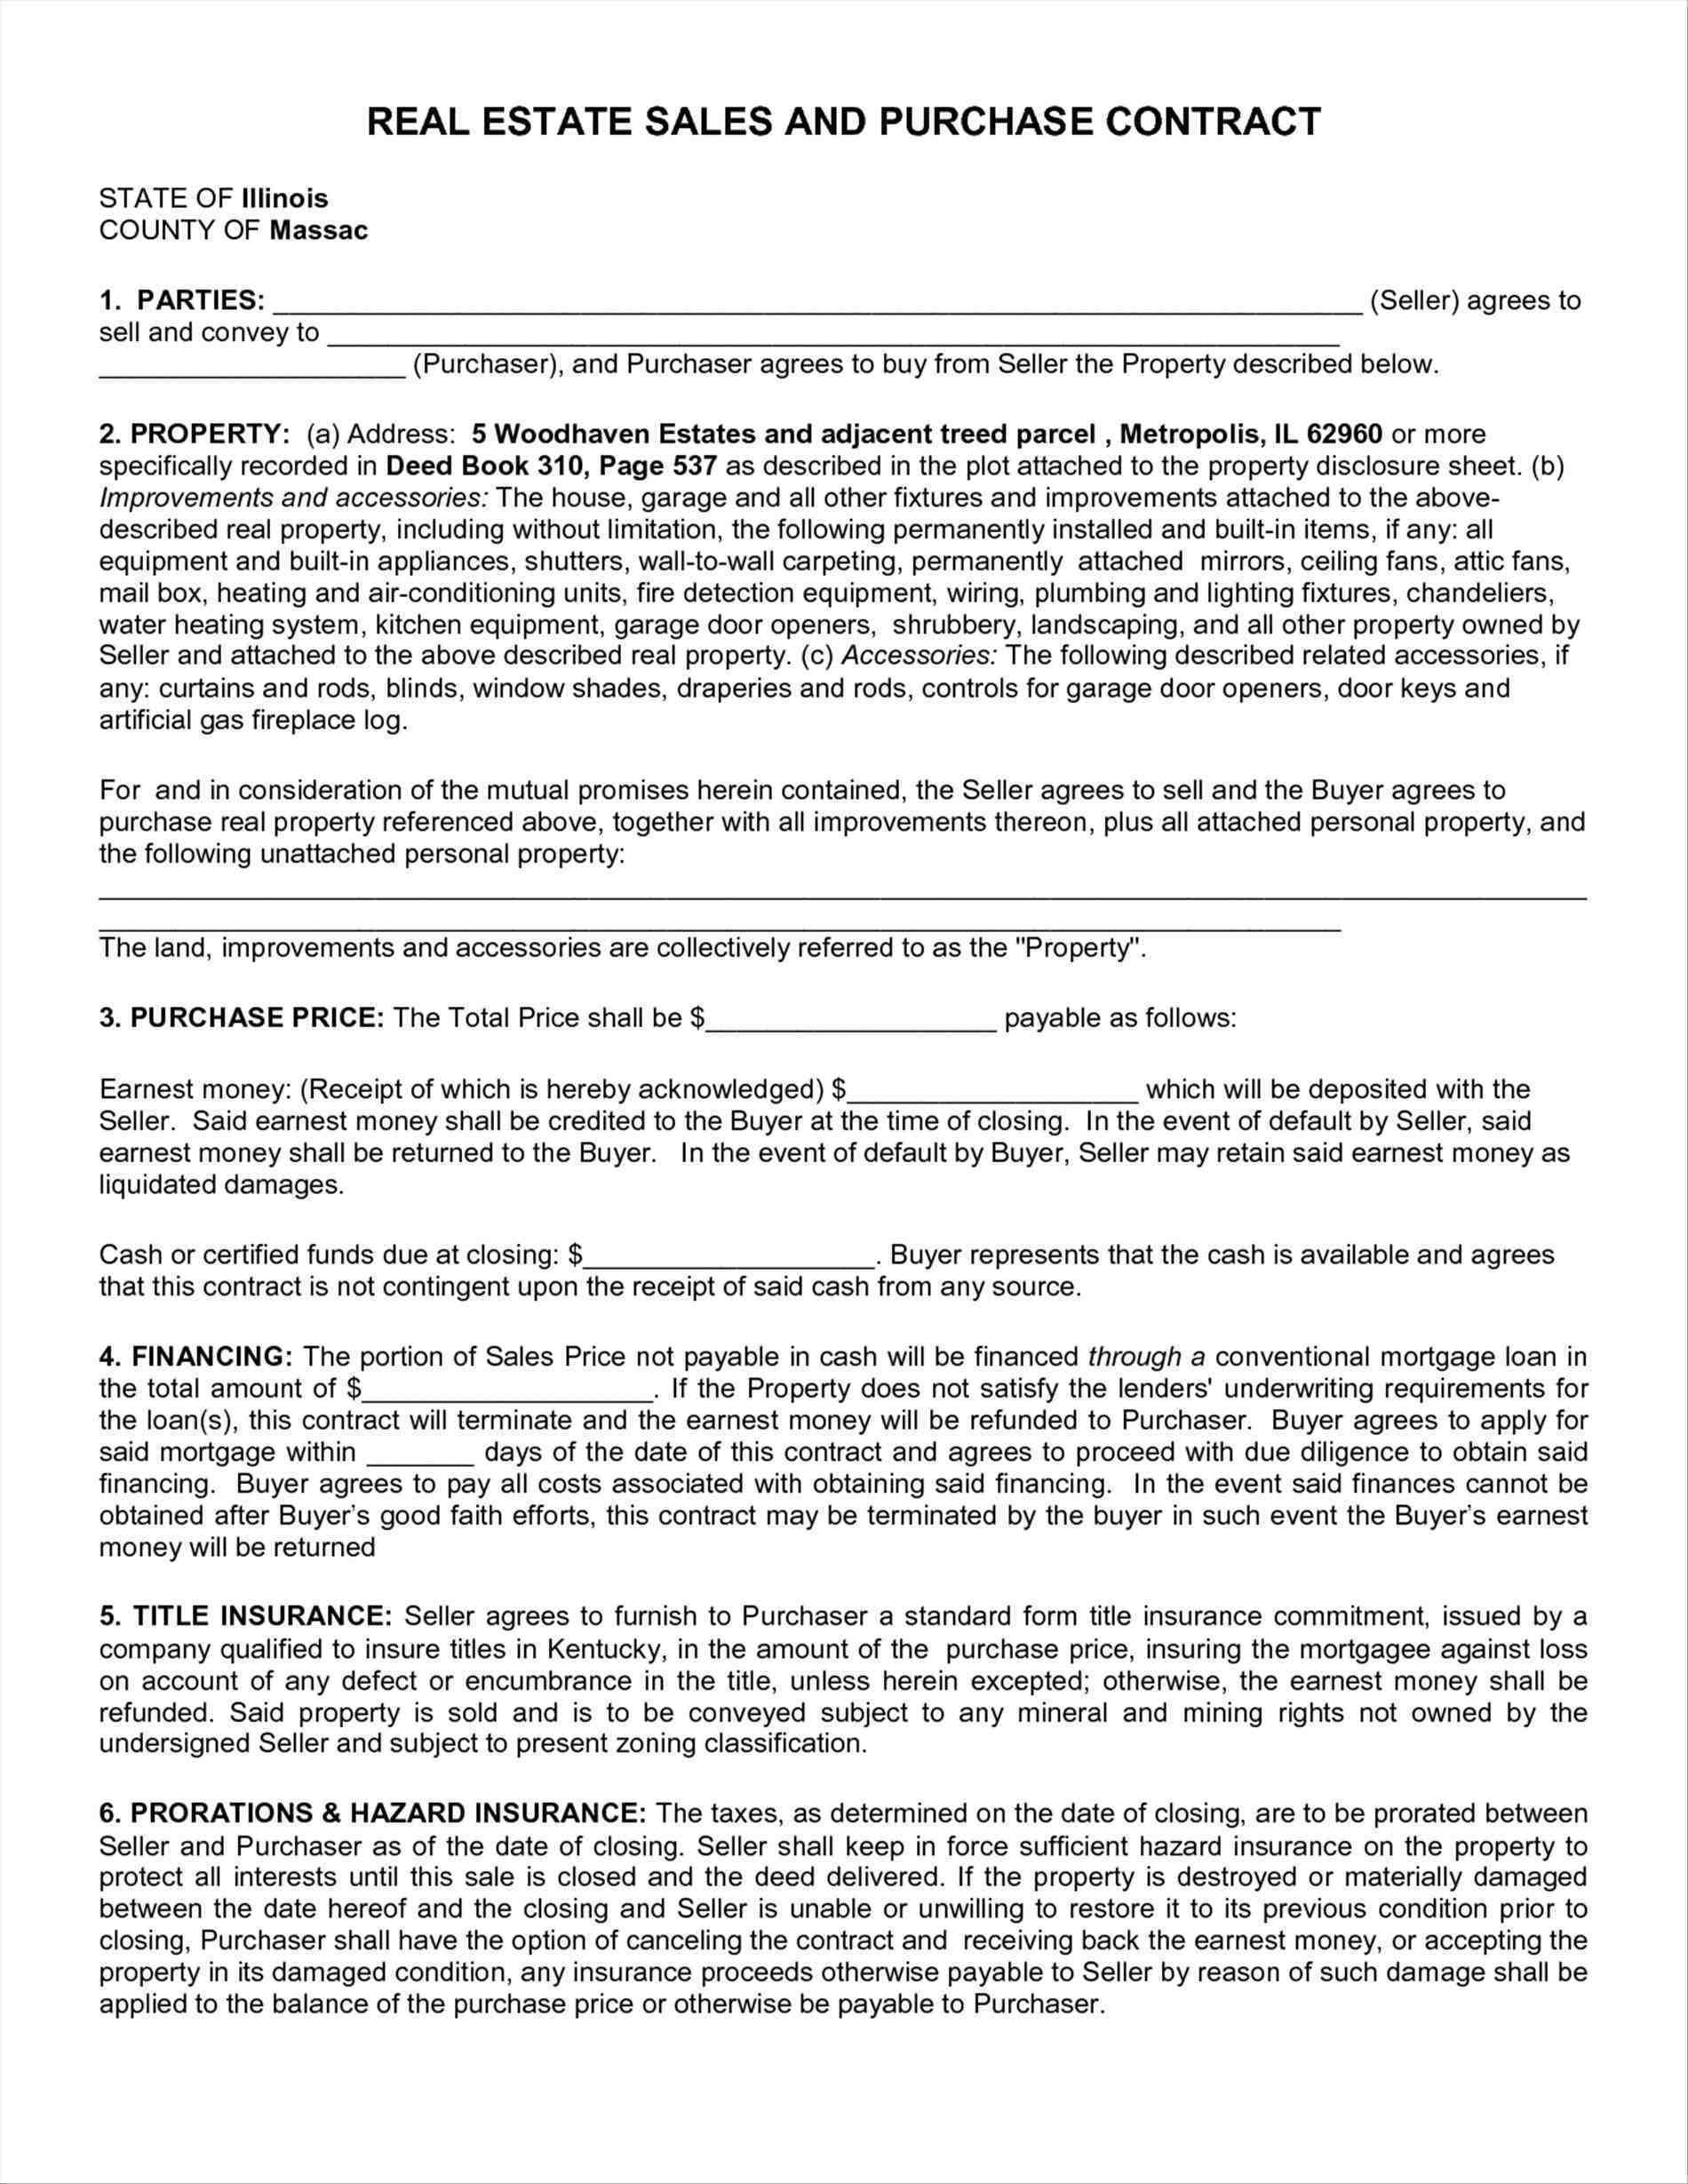 Fsbo Offer Letter Template - Free Cover Letter Templates Letter to Seller From Er Template